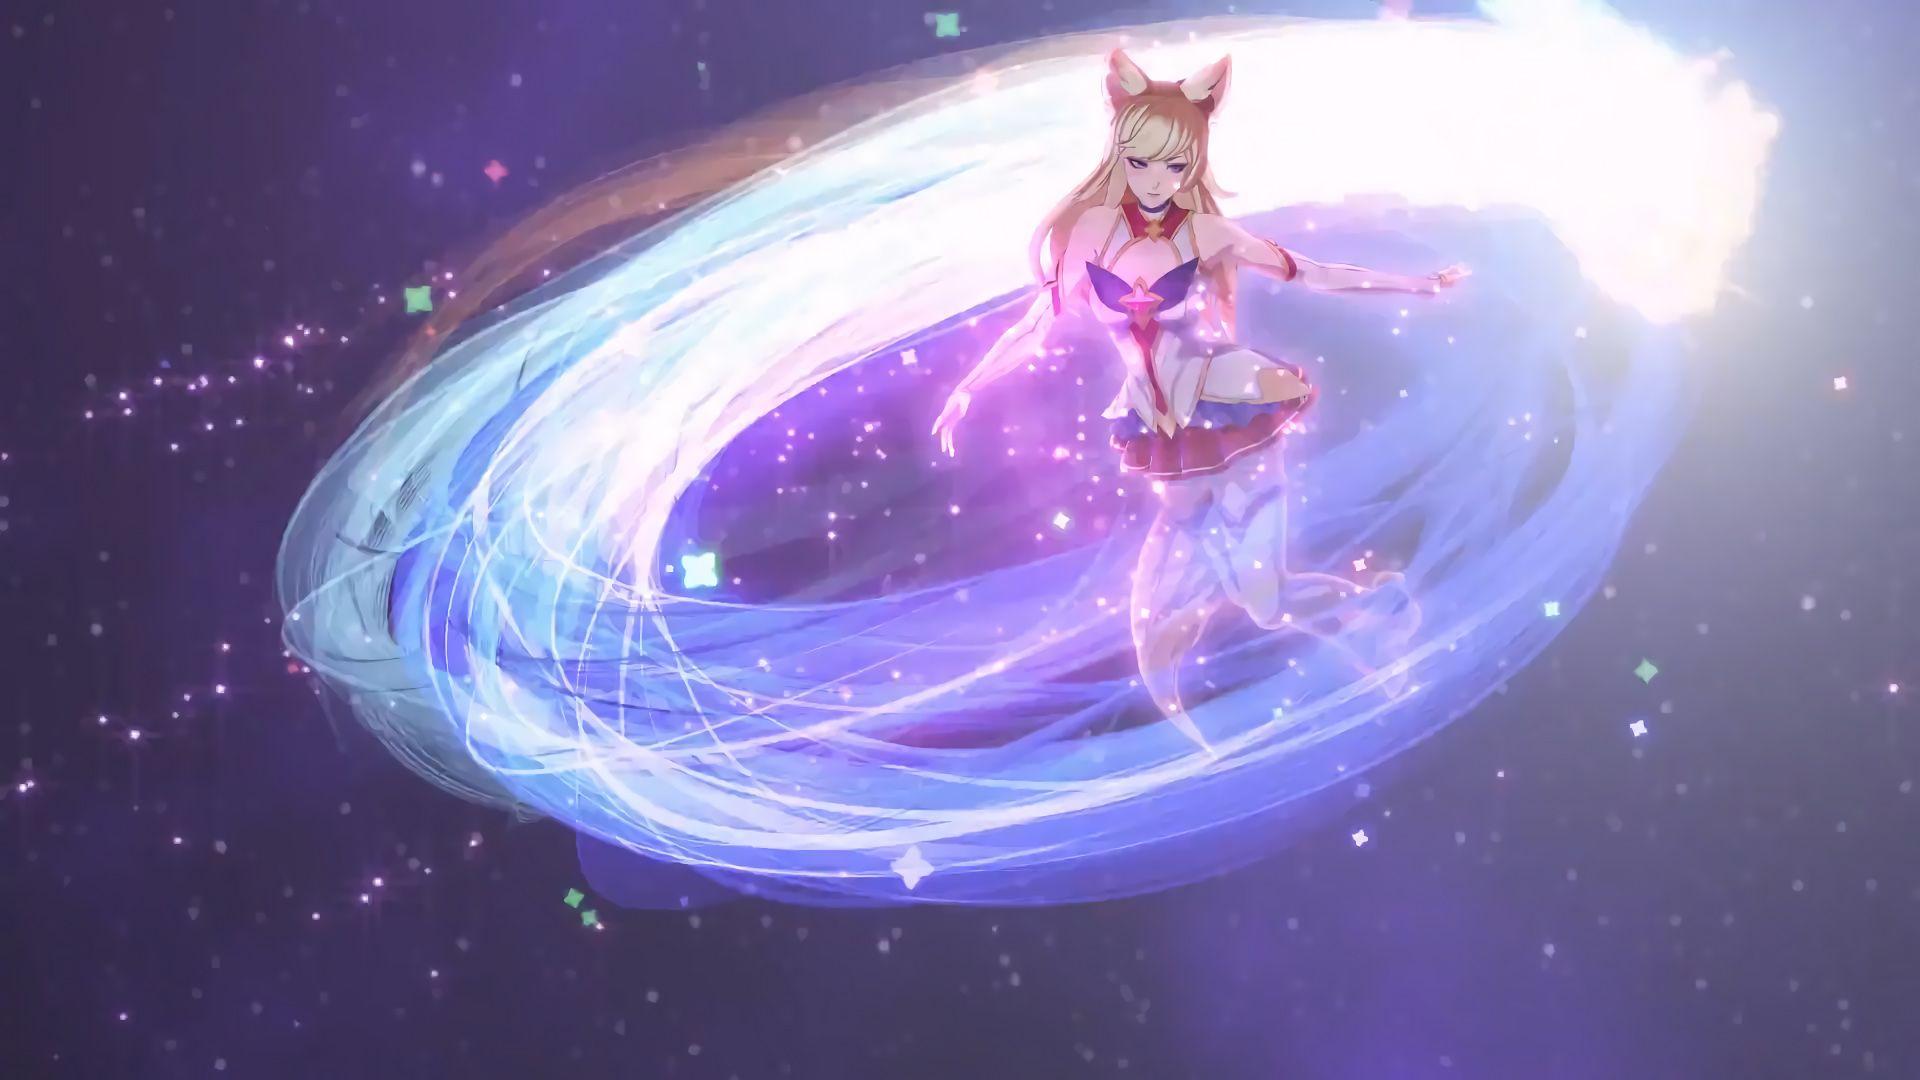 A New Horizon Star Guardian Ahri Cinematic 11 Hd Wallpaper Background Official Artwork League Of Legends Lol Gambar